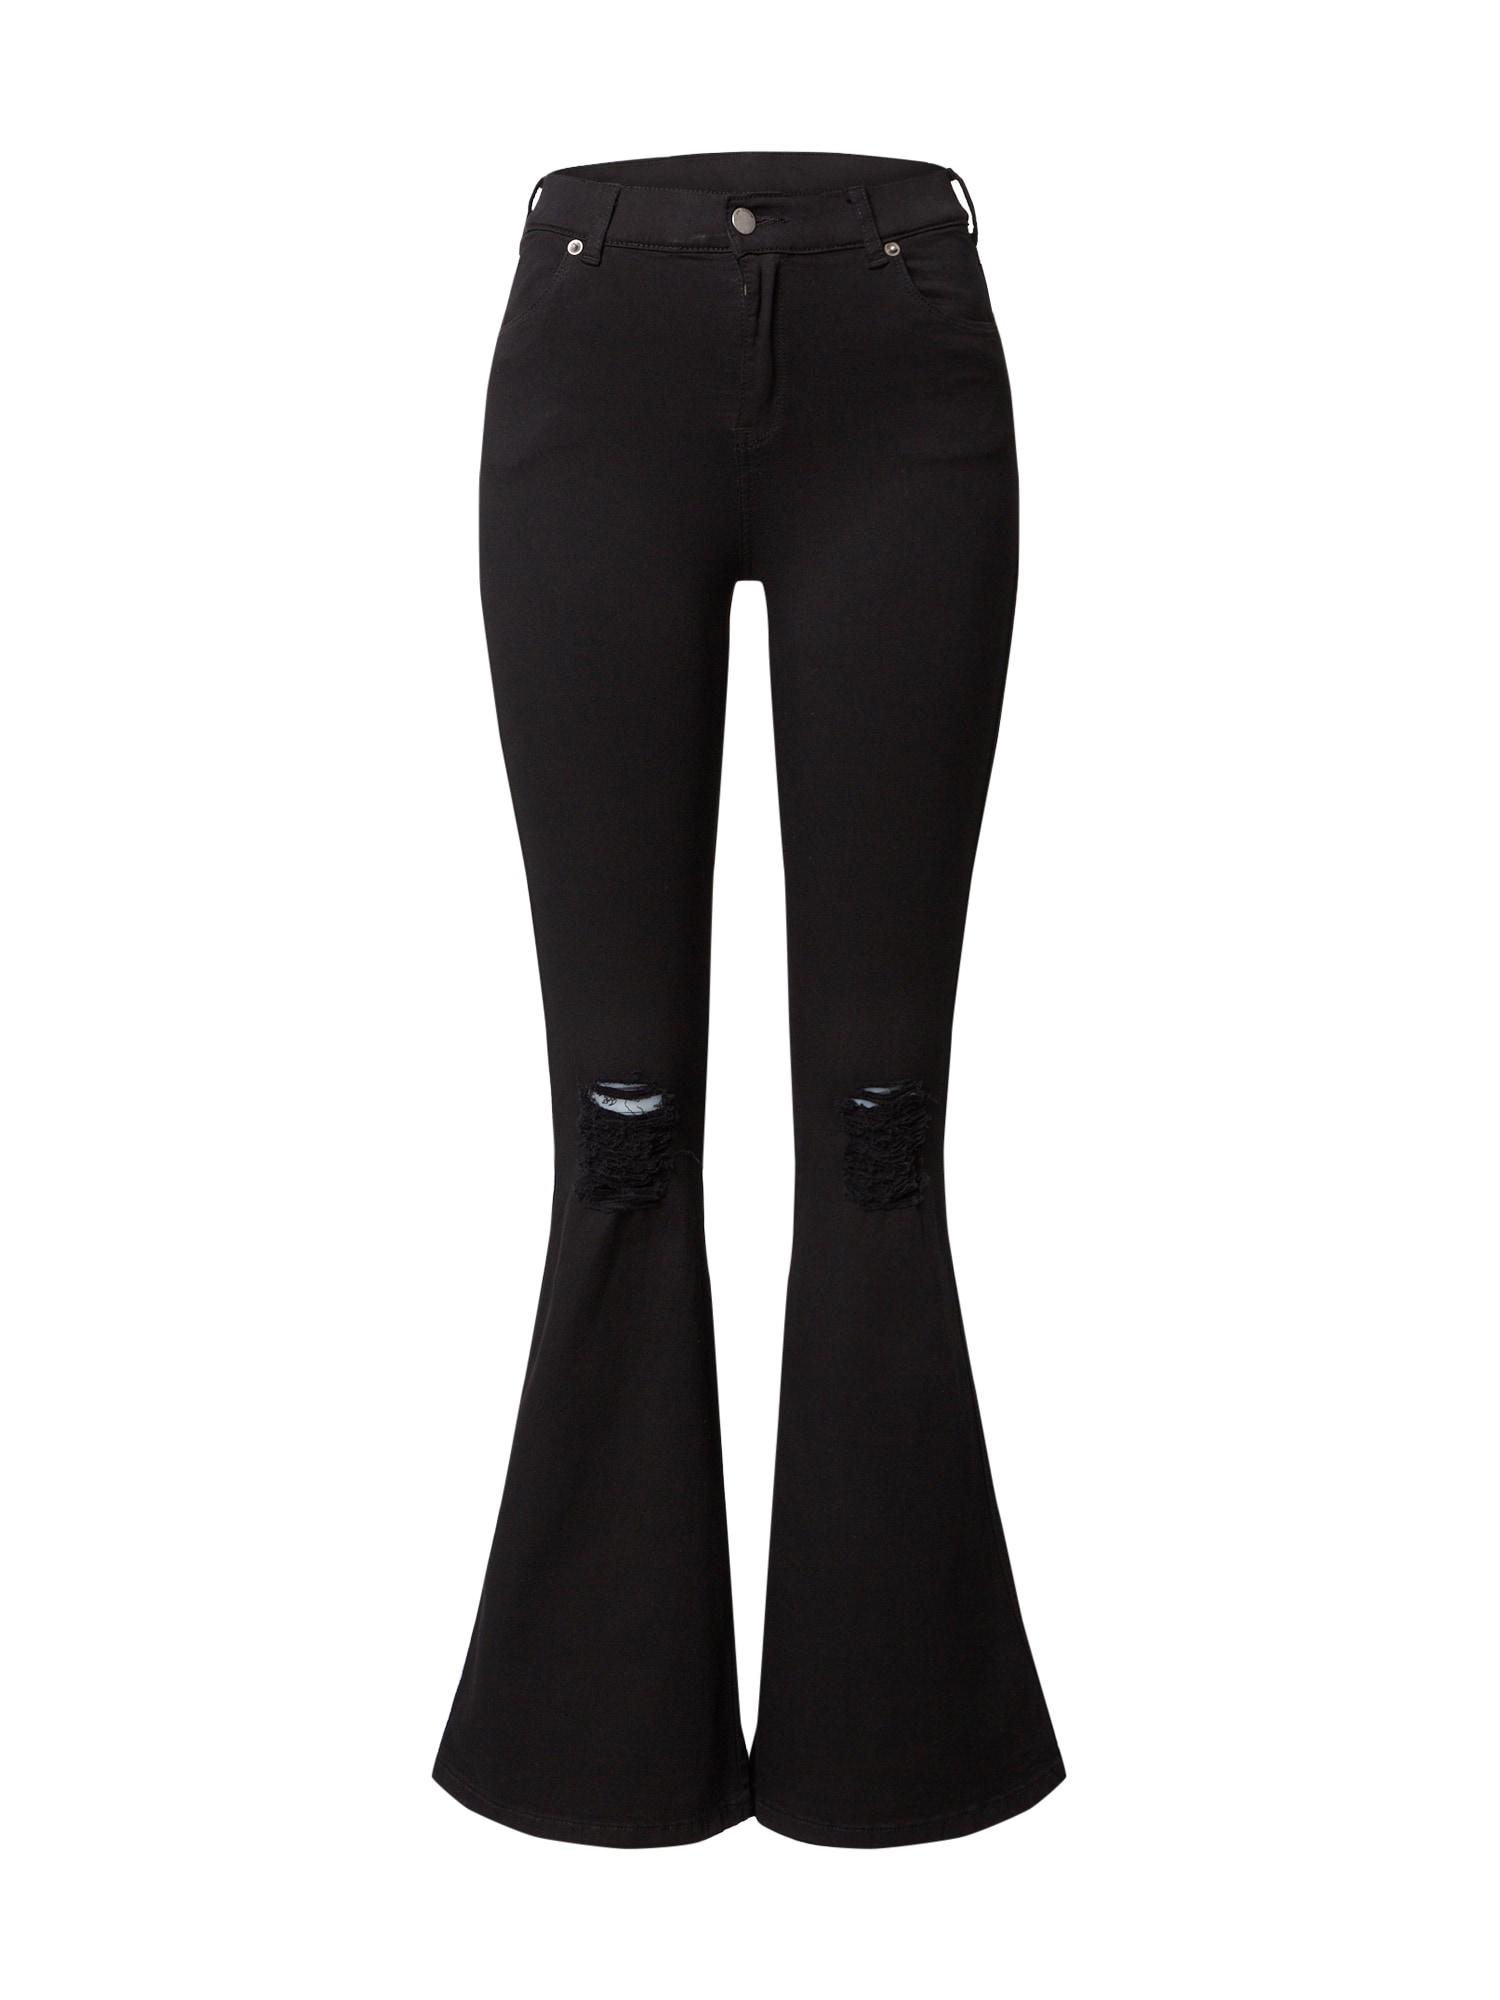 Dr. Denim Džinsai 'Macy' juodo džinso spalva